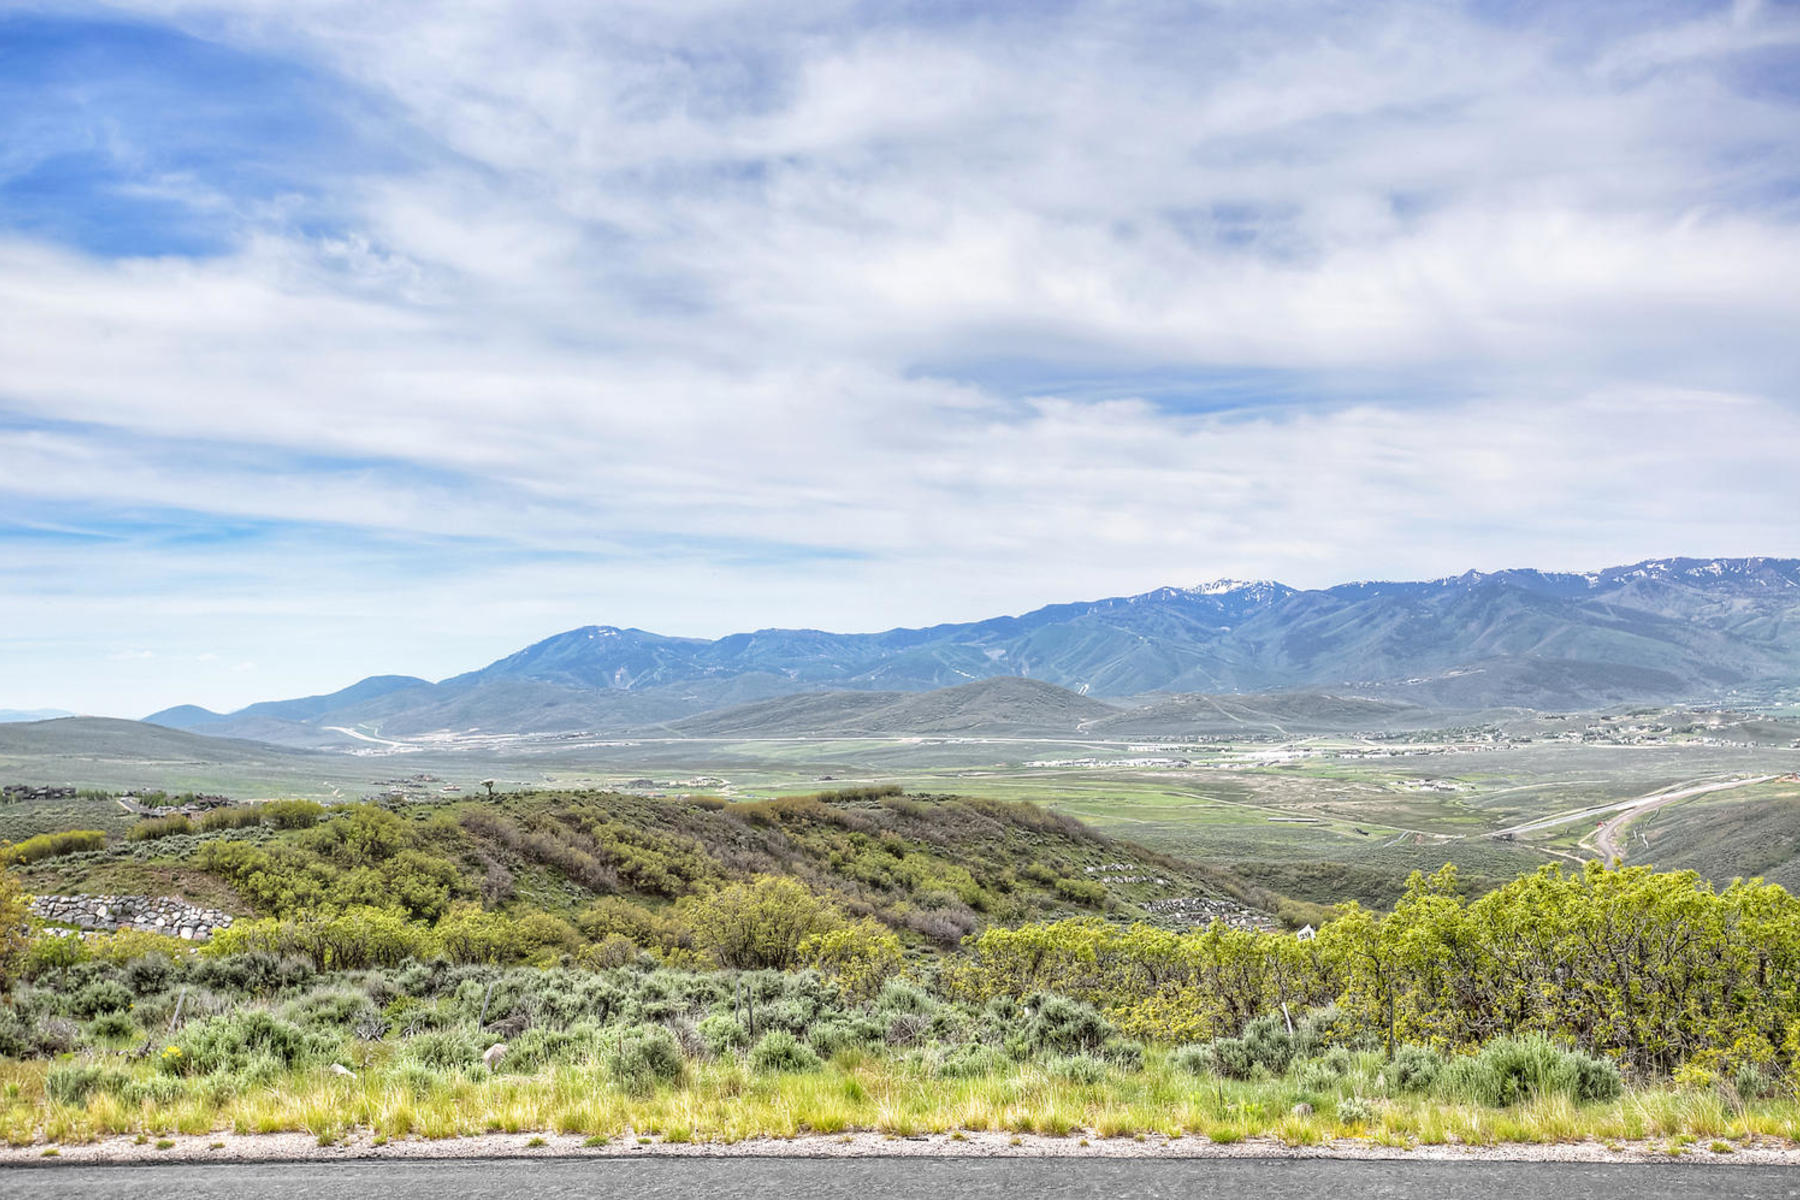 Terreno para Venda às Remington Cabin Homesite With Phenomenal Views To Ski Resorts 8984 N Hidden Hill Lp Lot 4 Park City, Utah, 84098 Estados Unidos